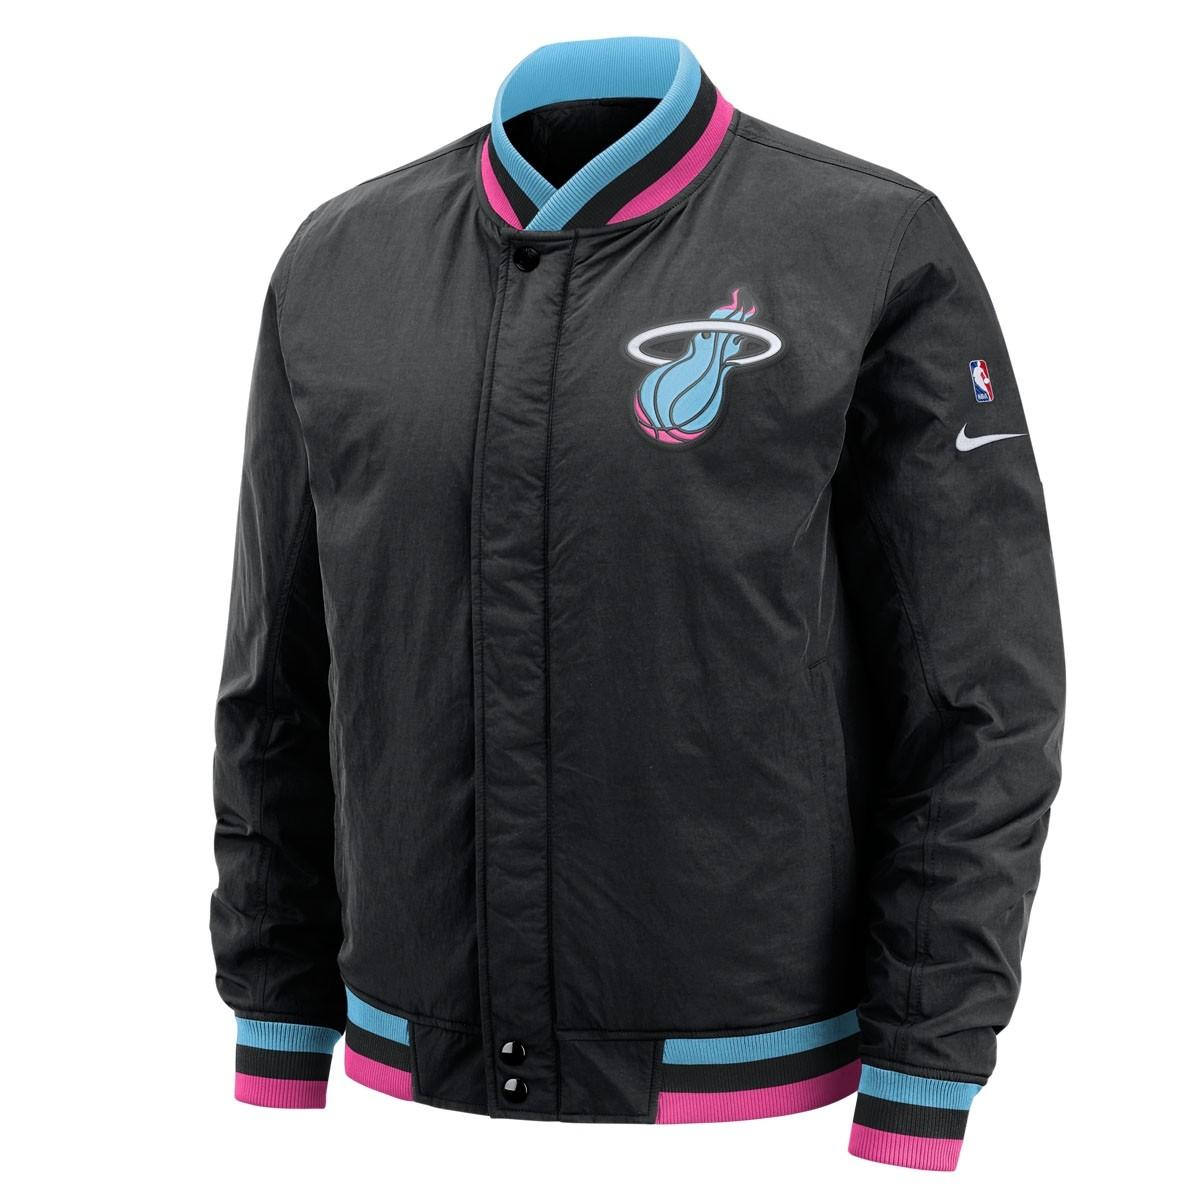 wholesale dealer 5bb9b c8280 Nike NBA Miami Heat Jacket Courtside